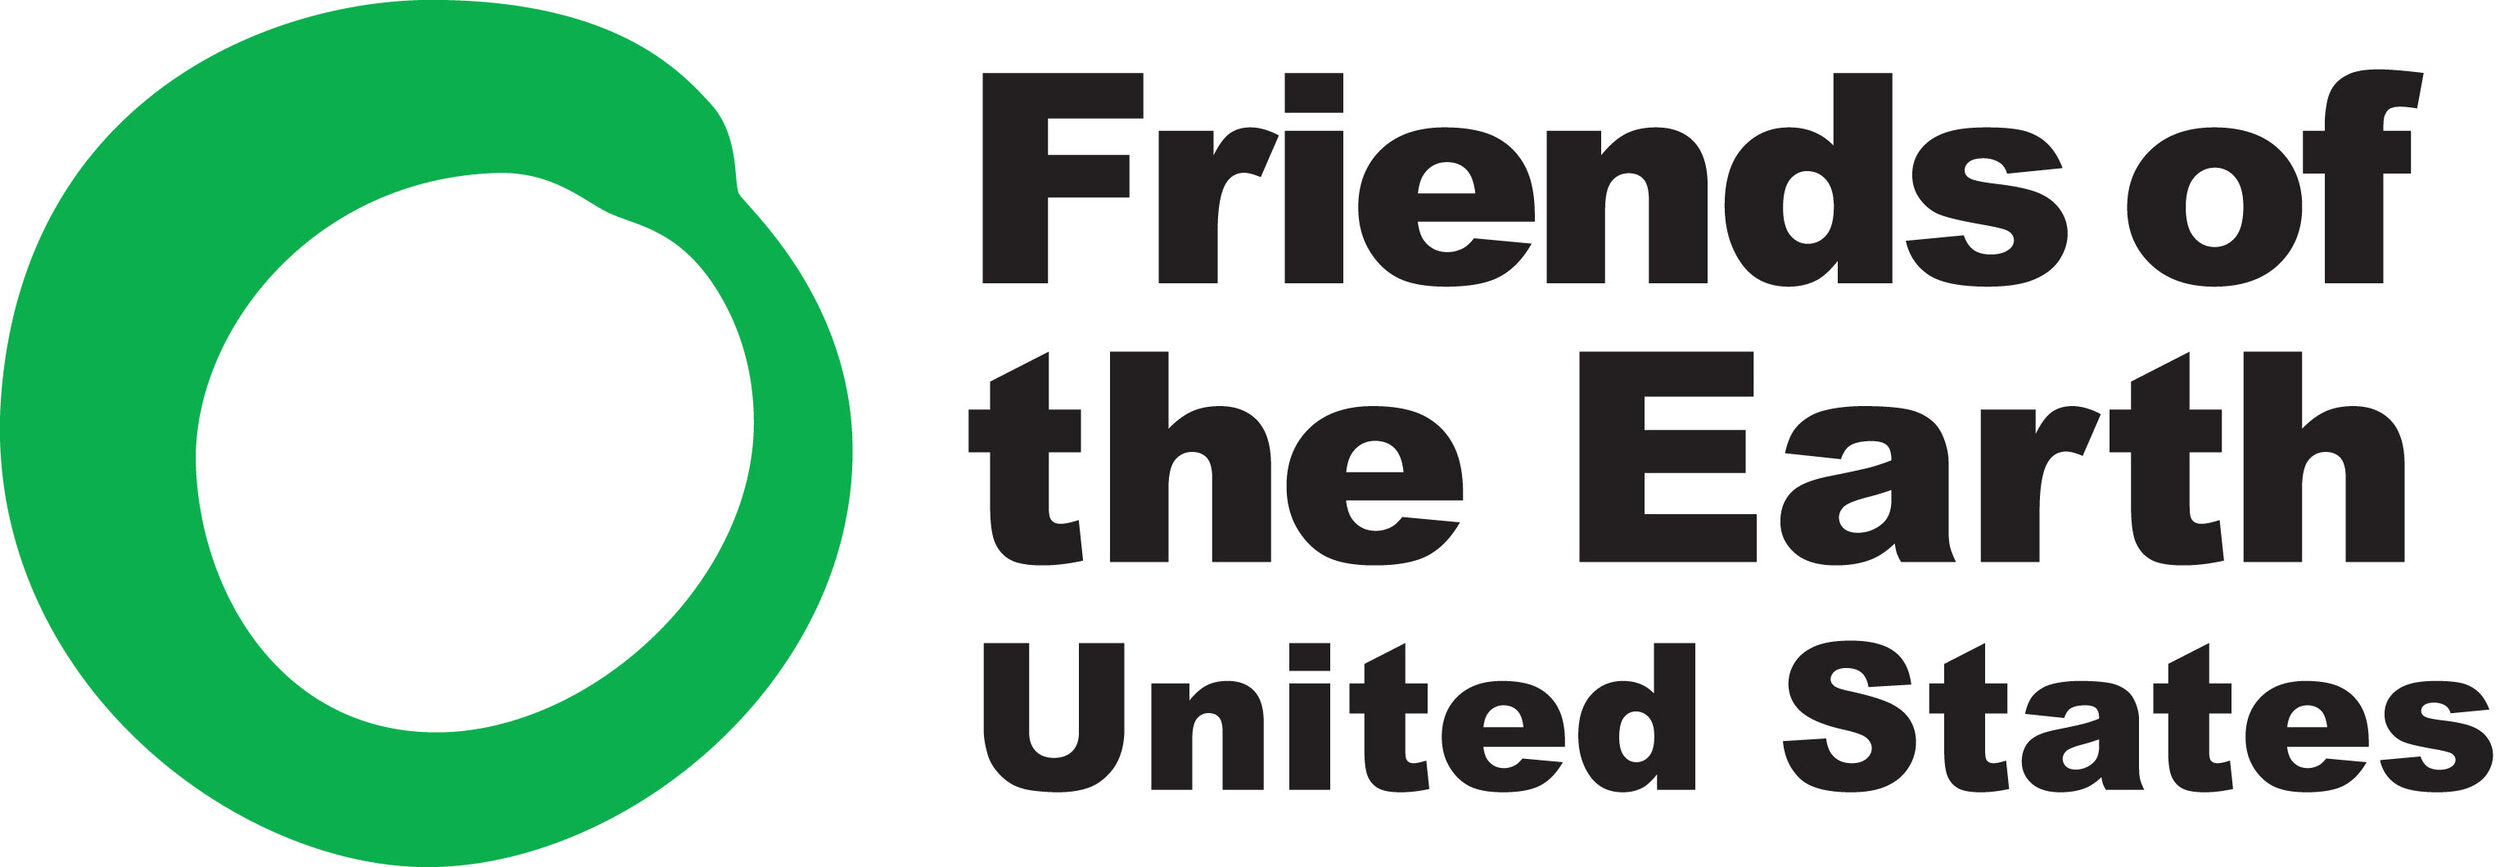 FOE United States logo.jpg